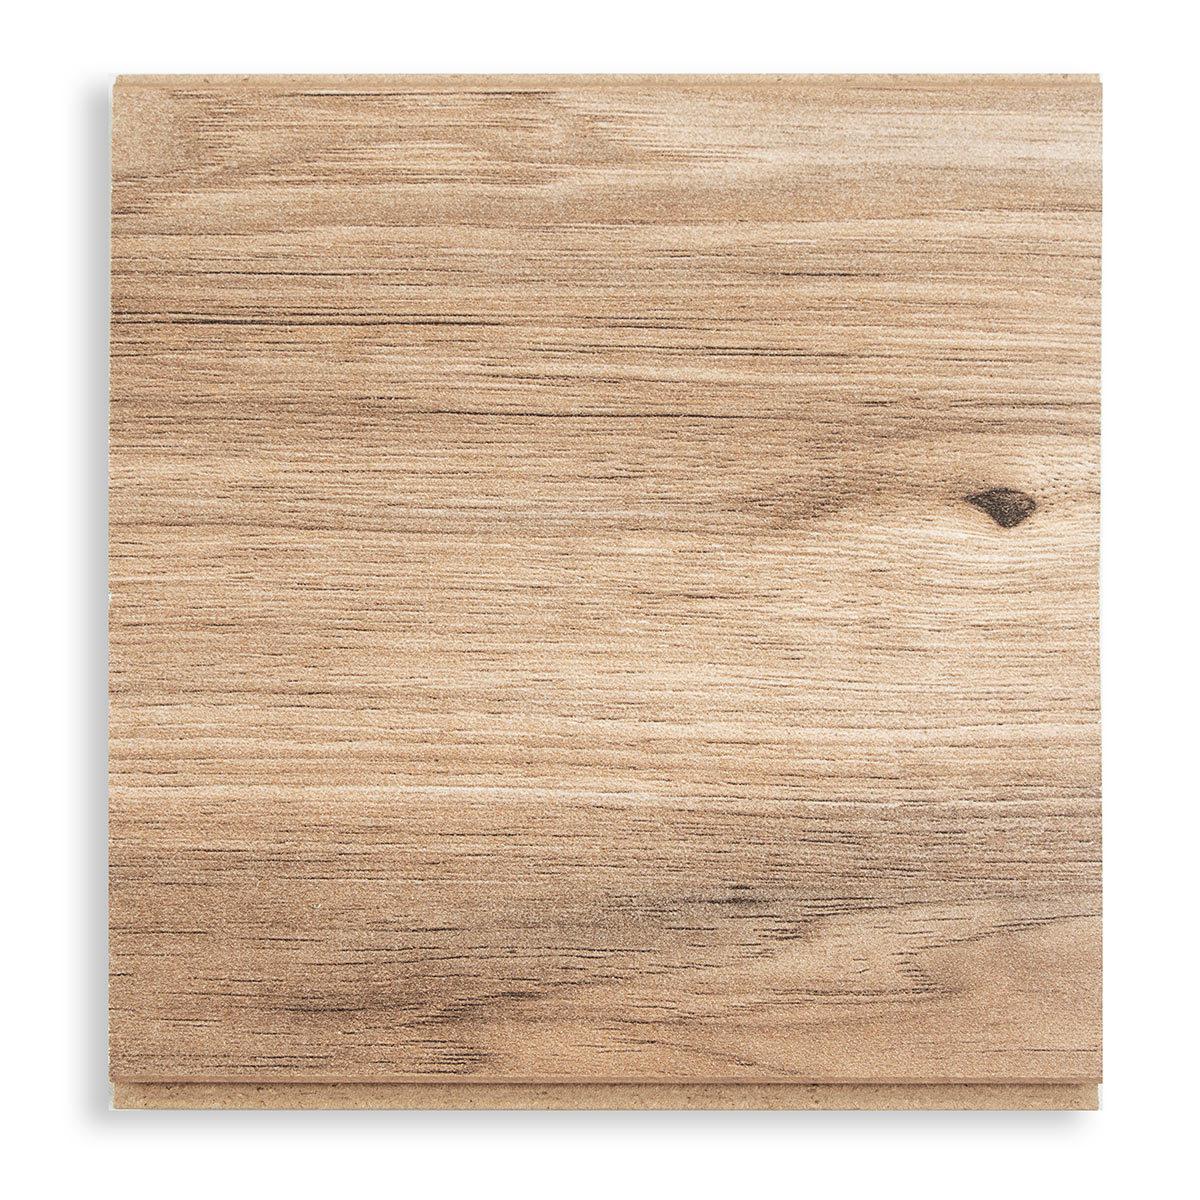 Golden Select Toledo Walnut Laminate, Walnut Laminate Flooring Costco